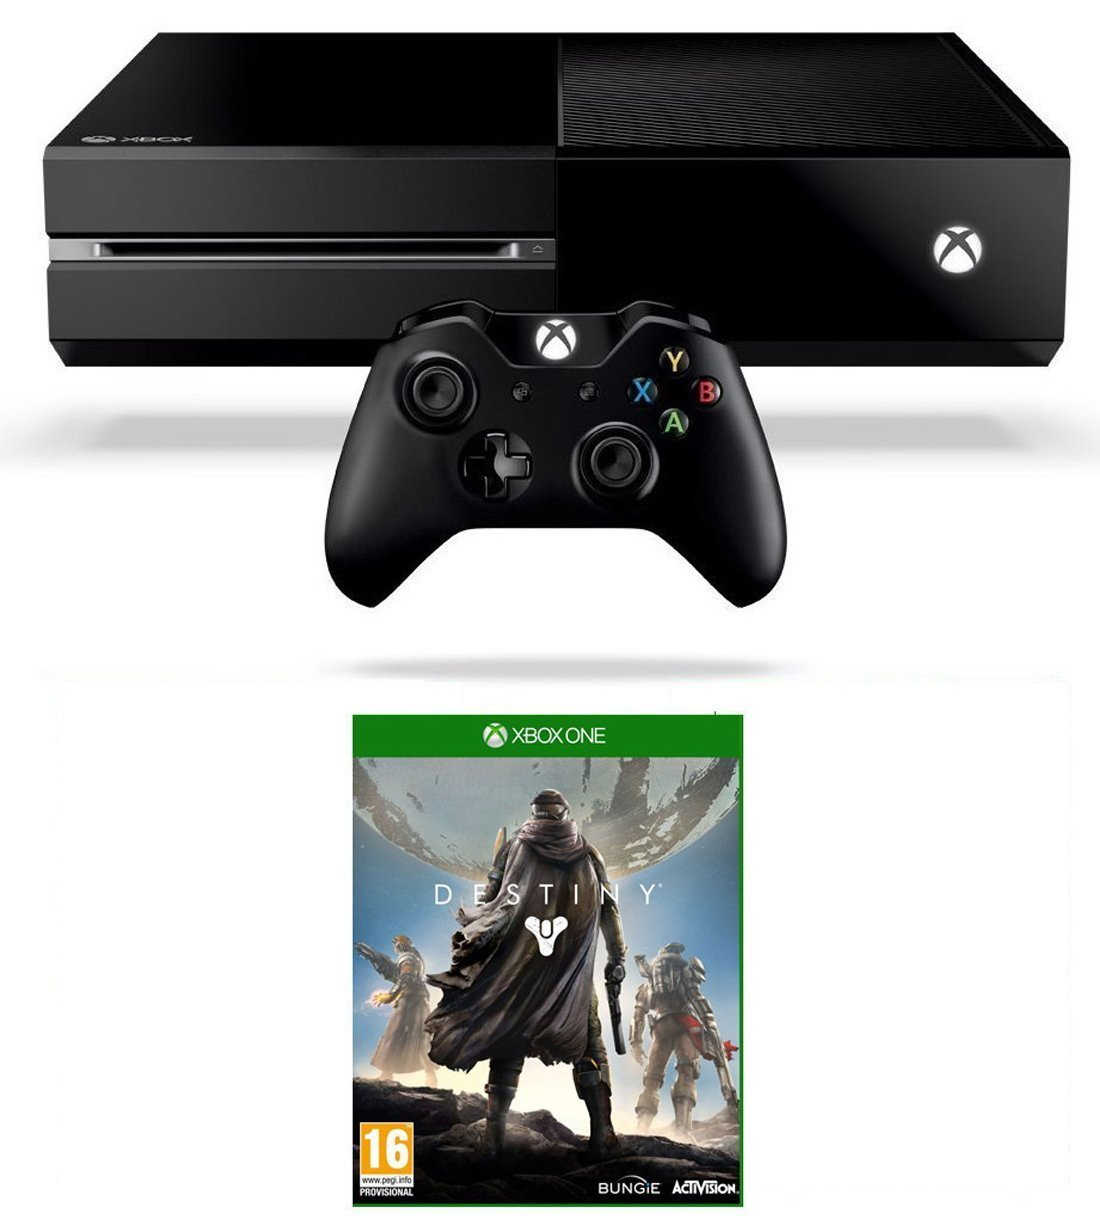 Xbox One Console with Destiny Amazoncouk